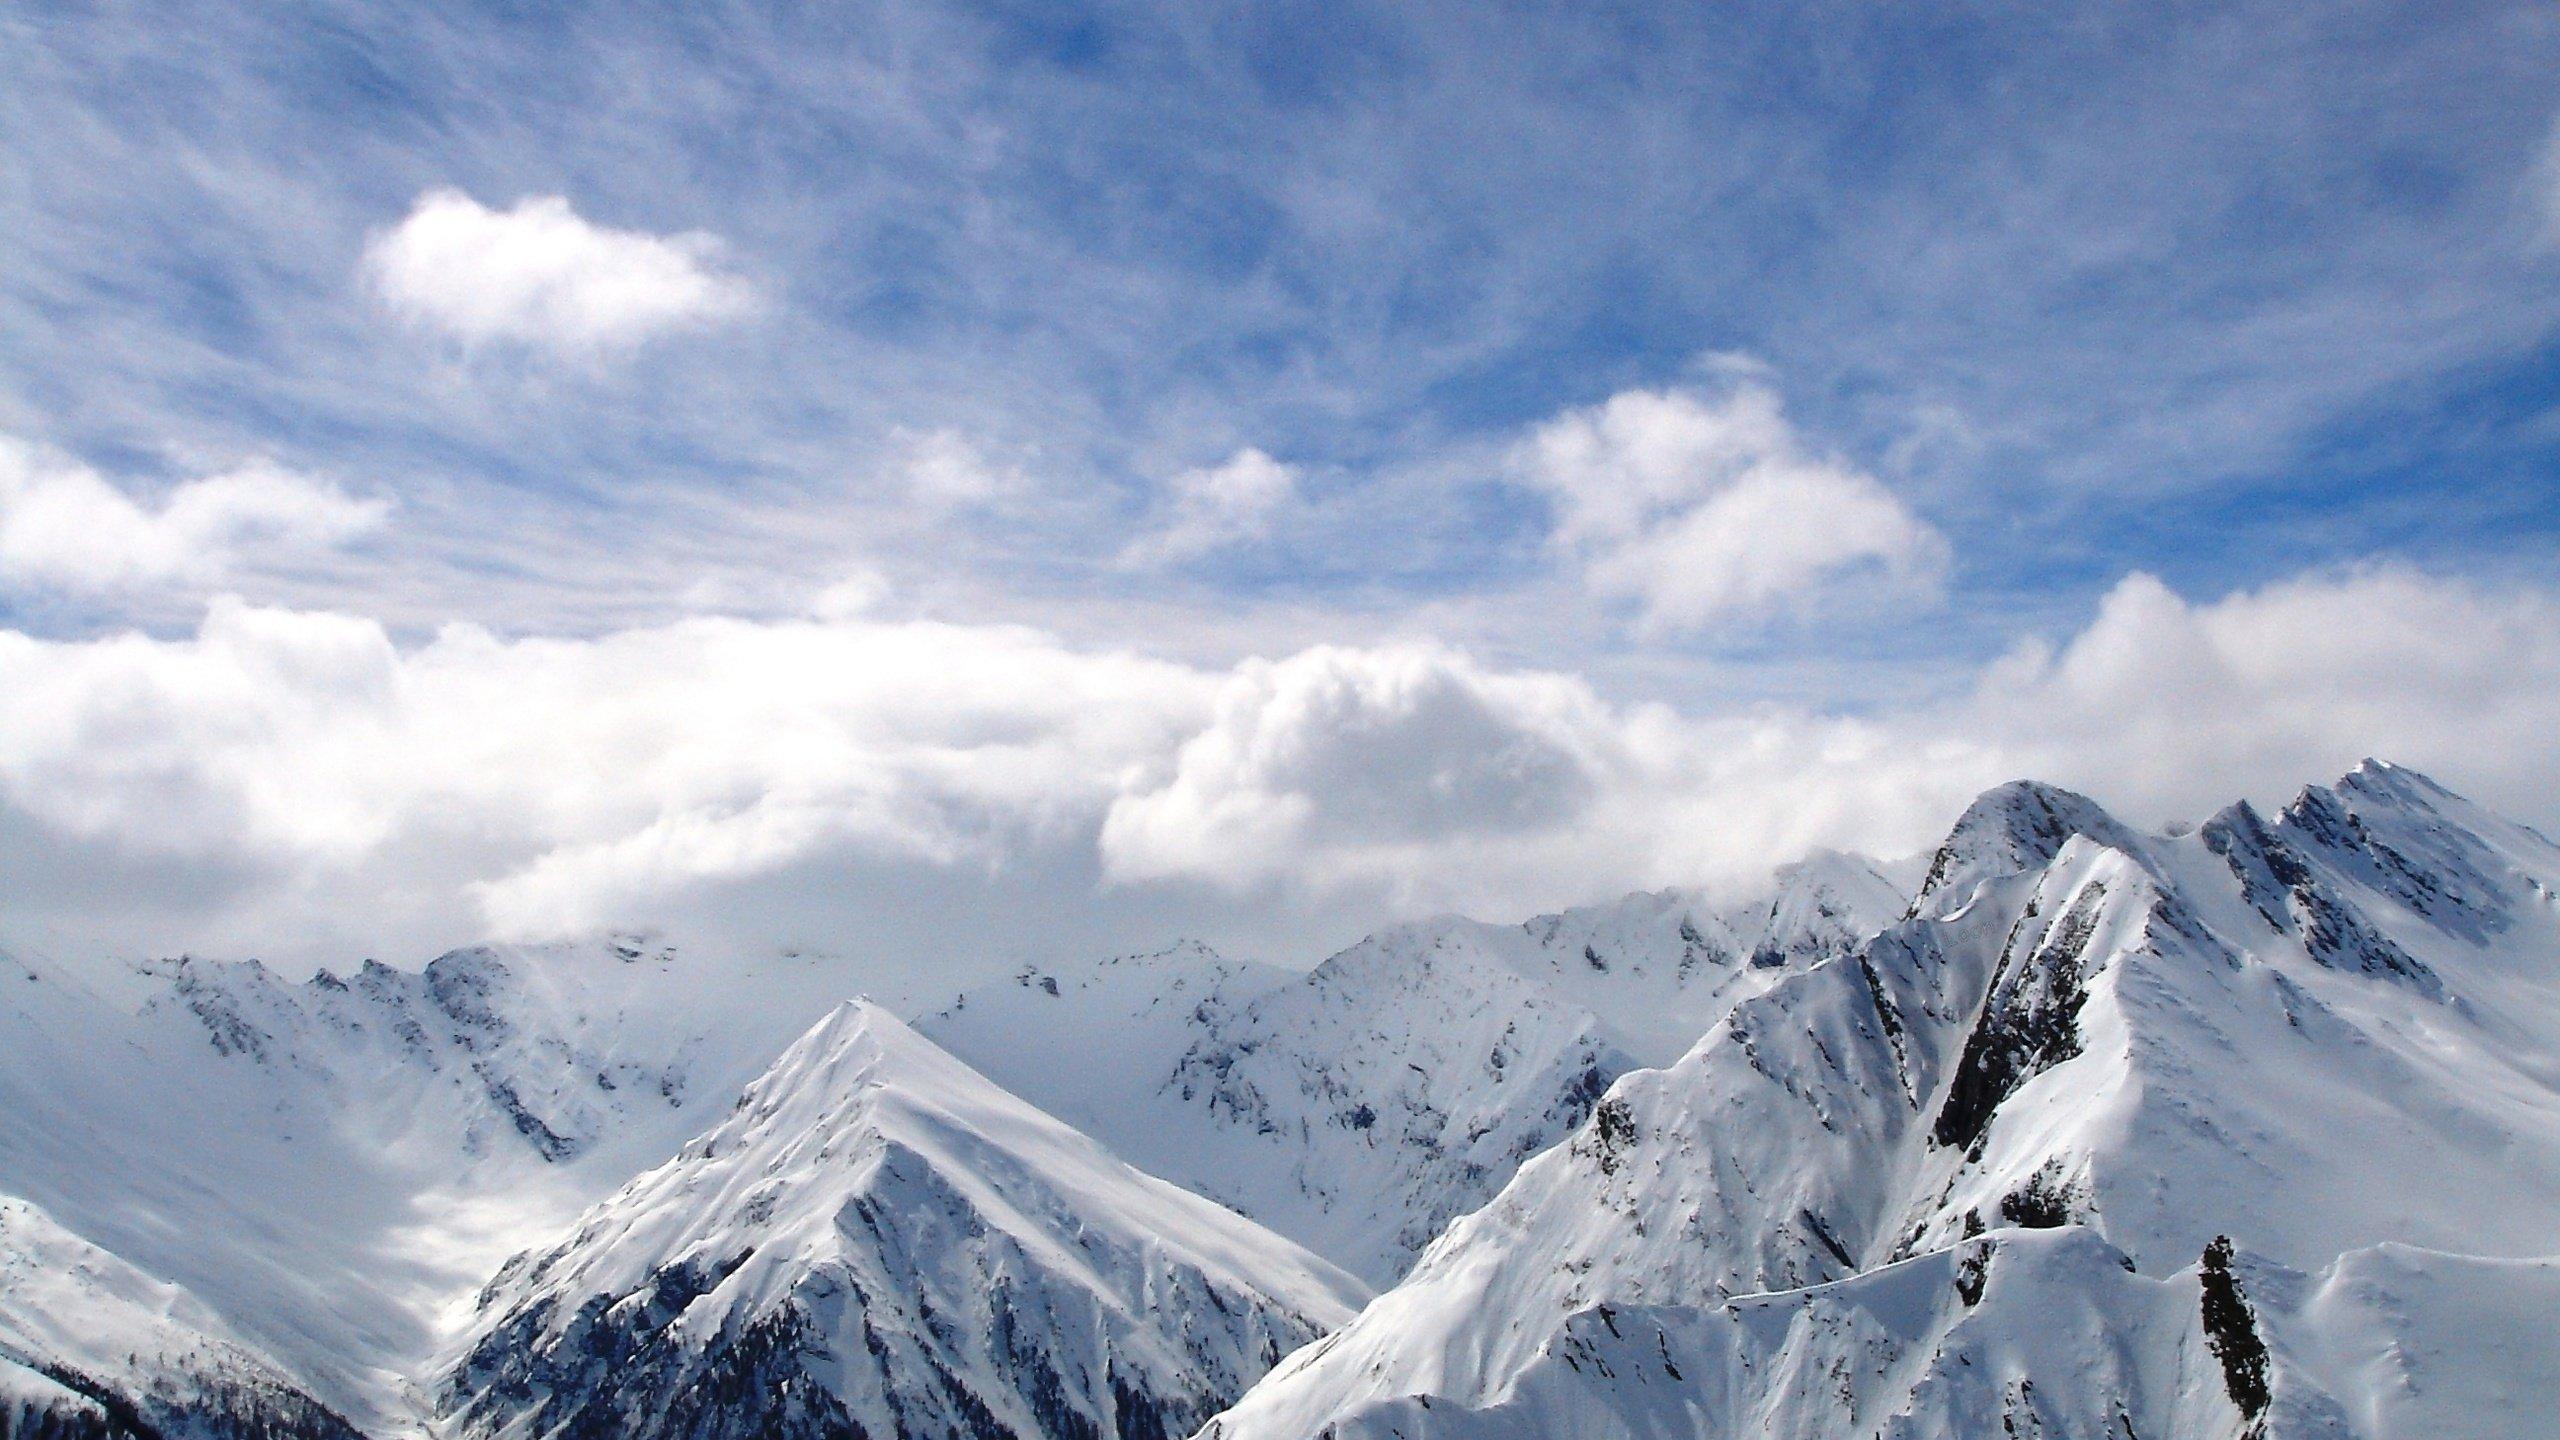 Mountains winter snow clouds white sky wallpaper 2560x1440 2560x1440